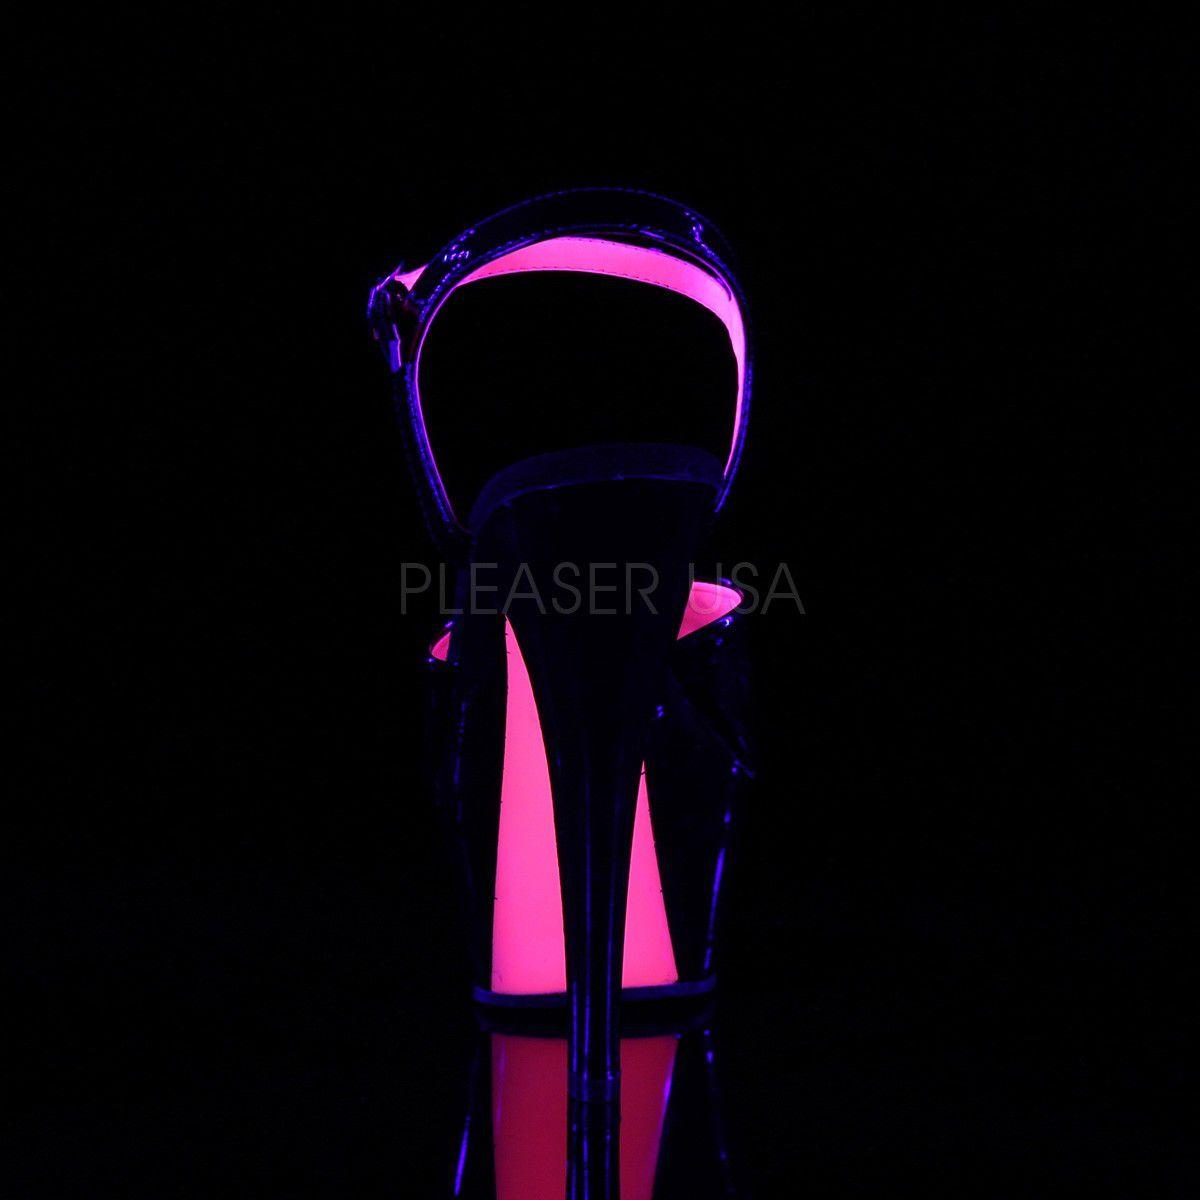 Sandália Kiss 209 TT - Pleaser (encomenda)